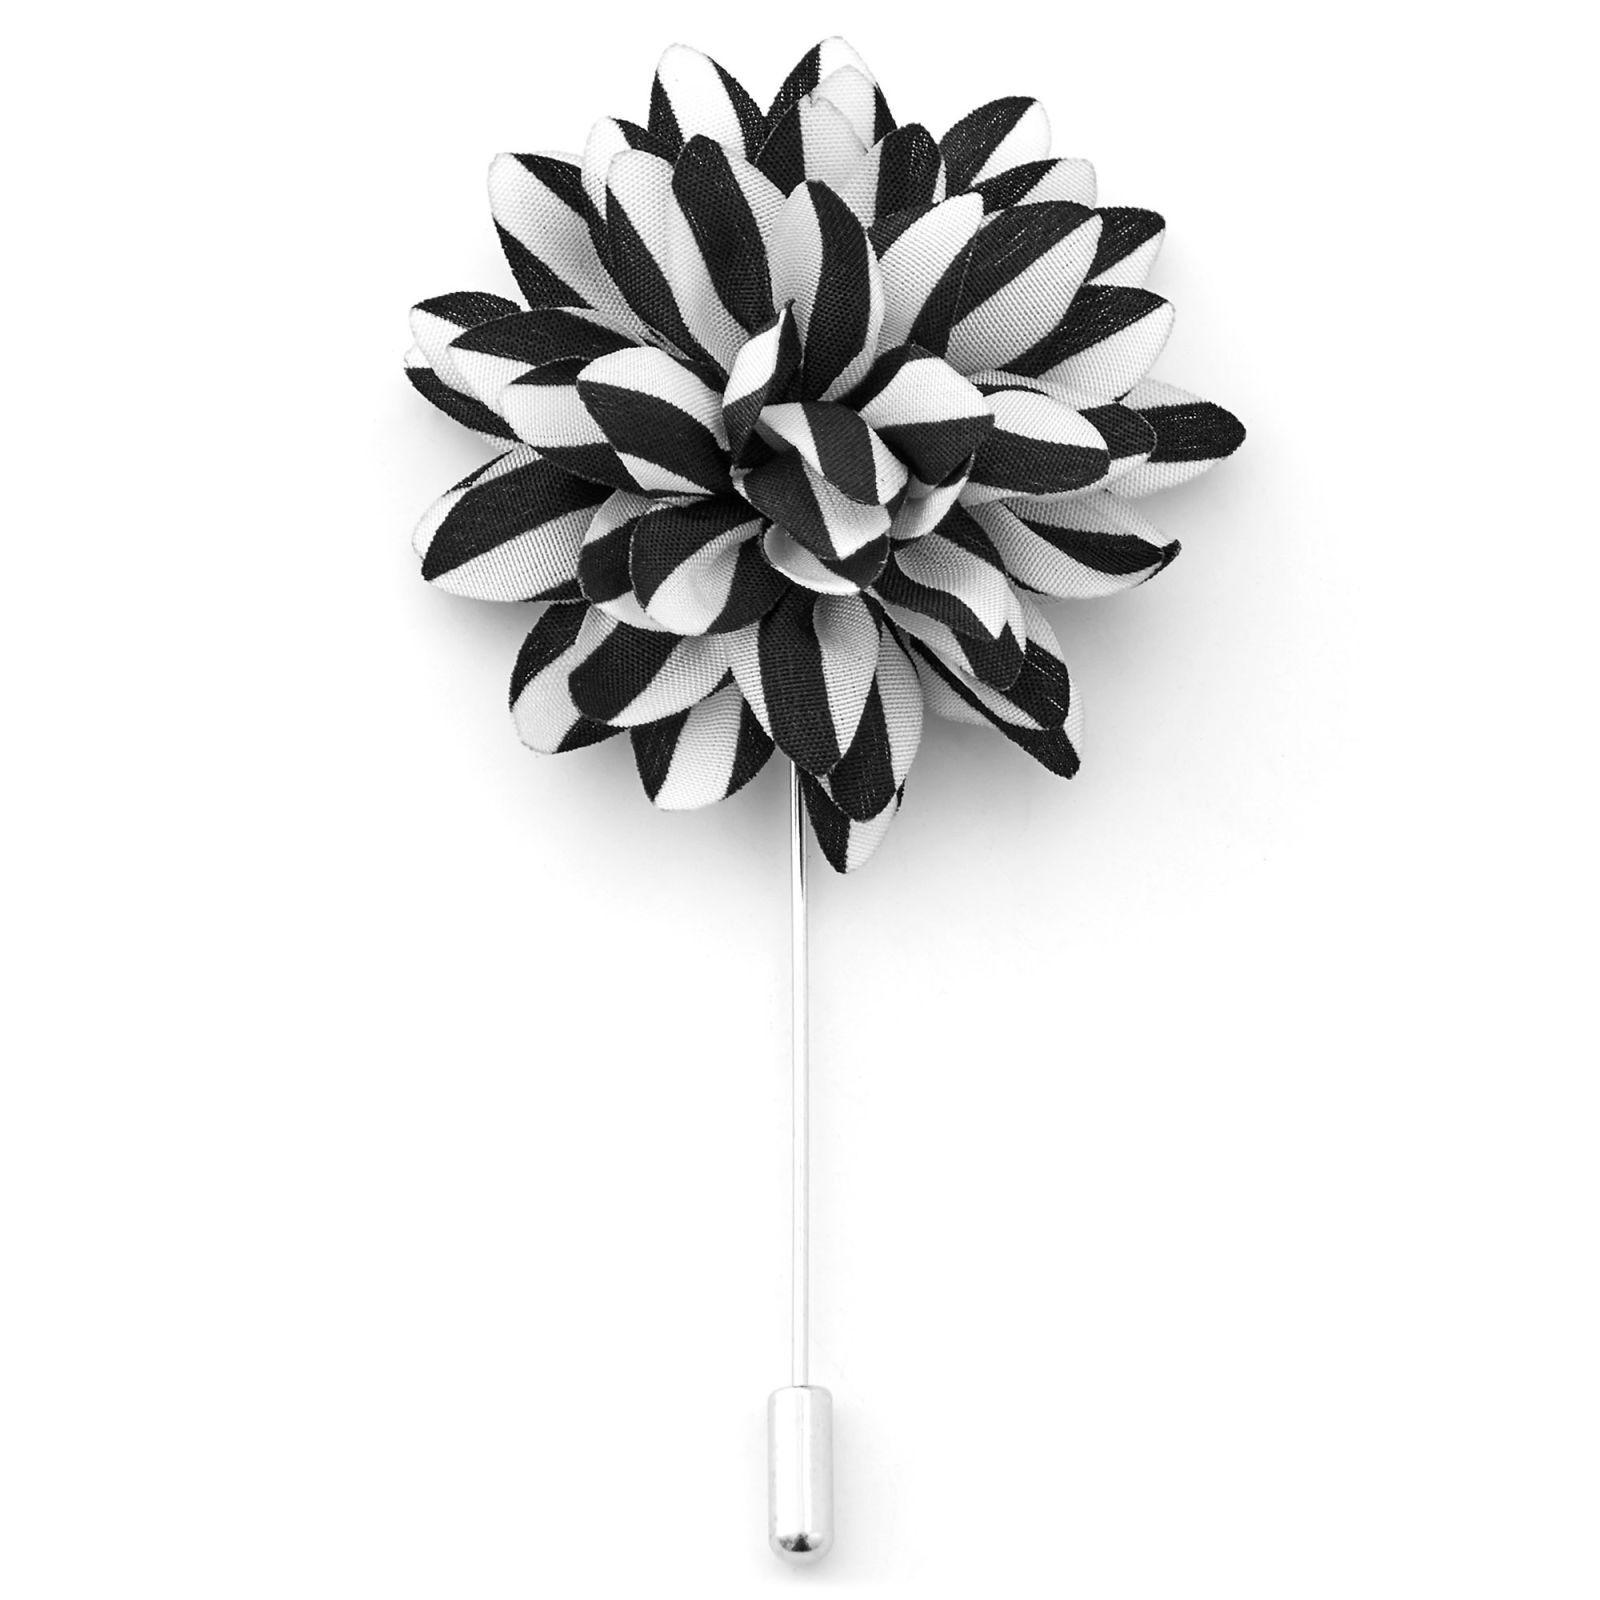 Warren Asher Musta & valkoinen kukkarintaneula